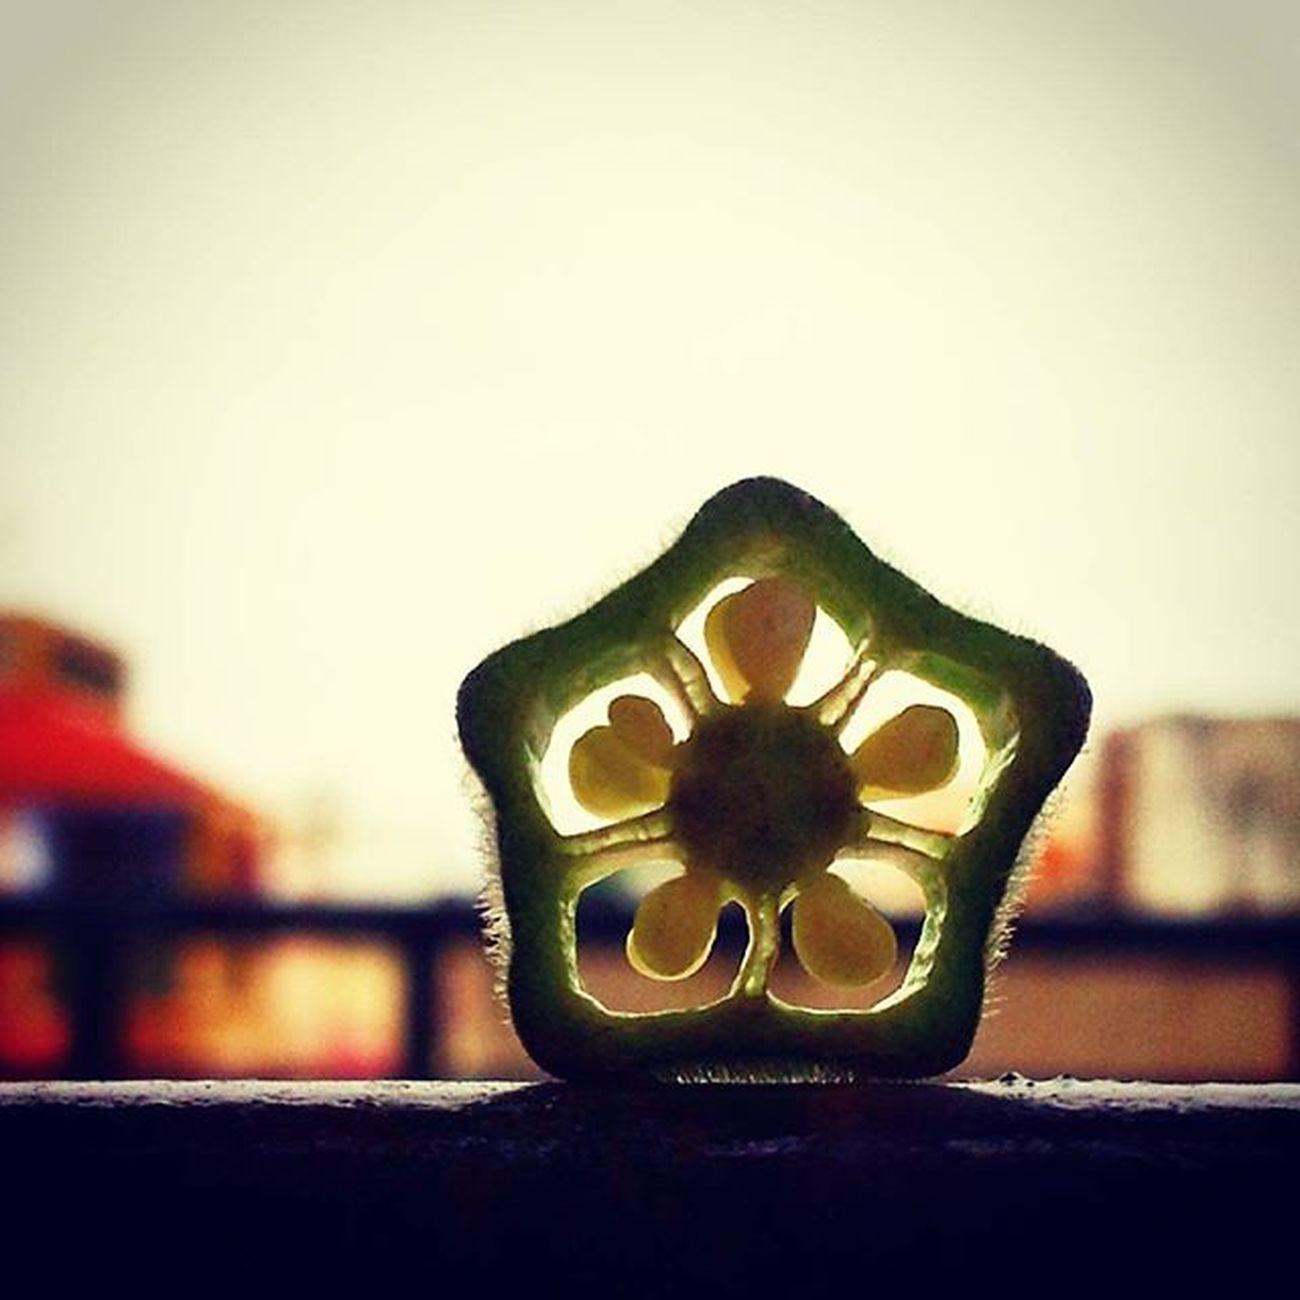 Ahmedabad_instagram Instagram_ahmedabad Desidiaries Uniqueclicks Soi TheLumians Lumiaclubindia Lumia730